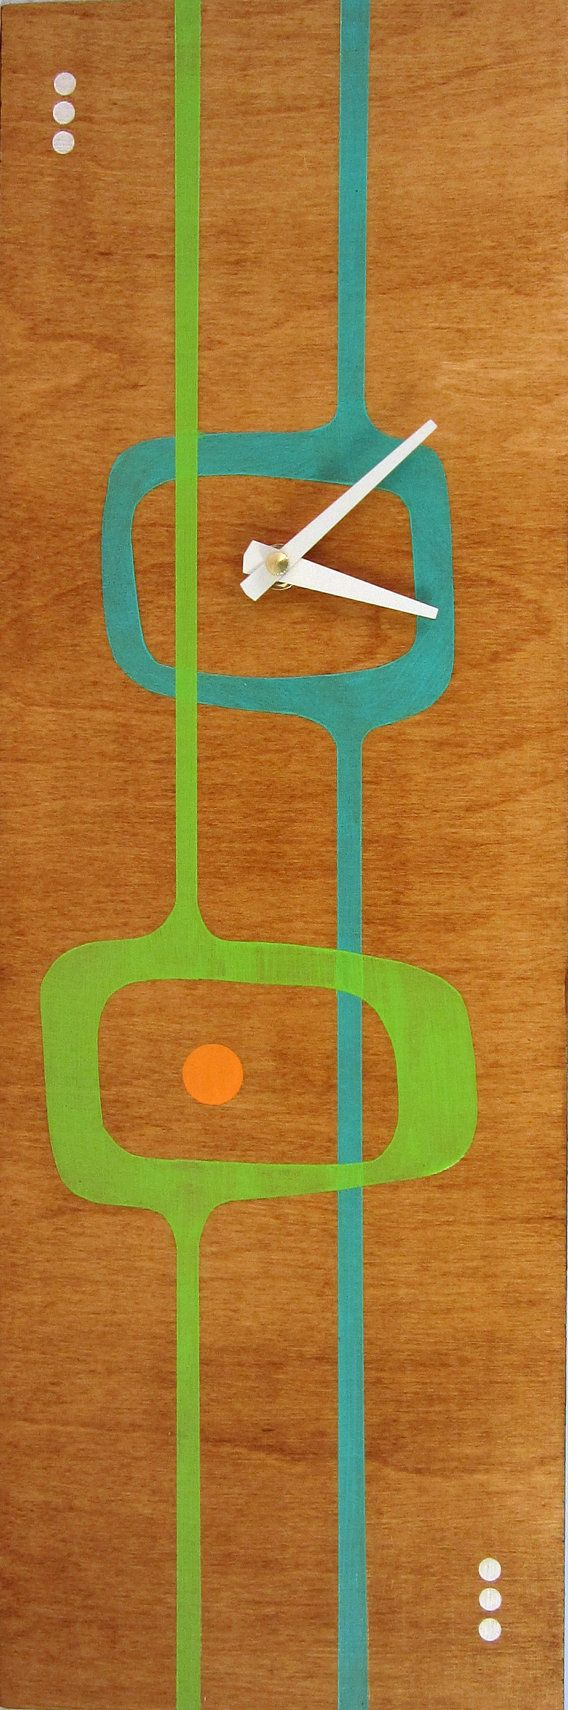 Retro Style Mid Century Modern MCM Abstract Clock by TikiQueenArts, $65.00